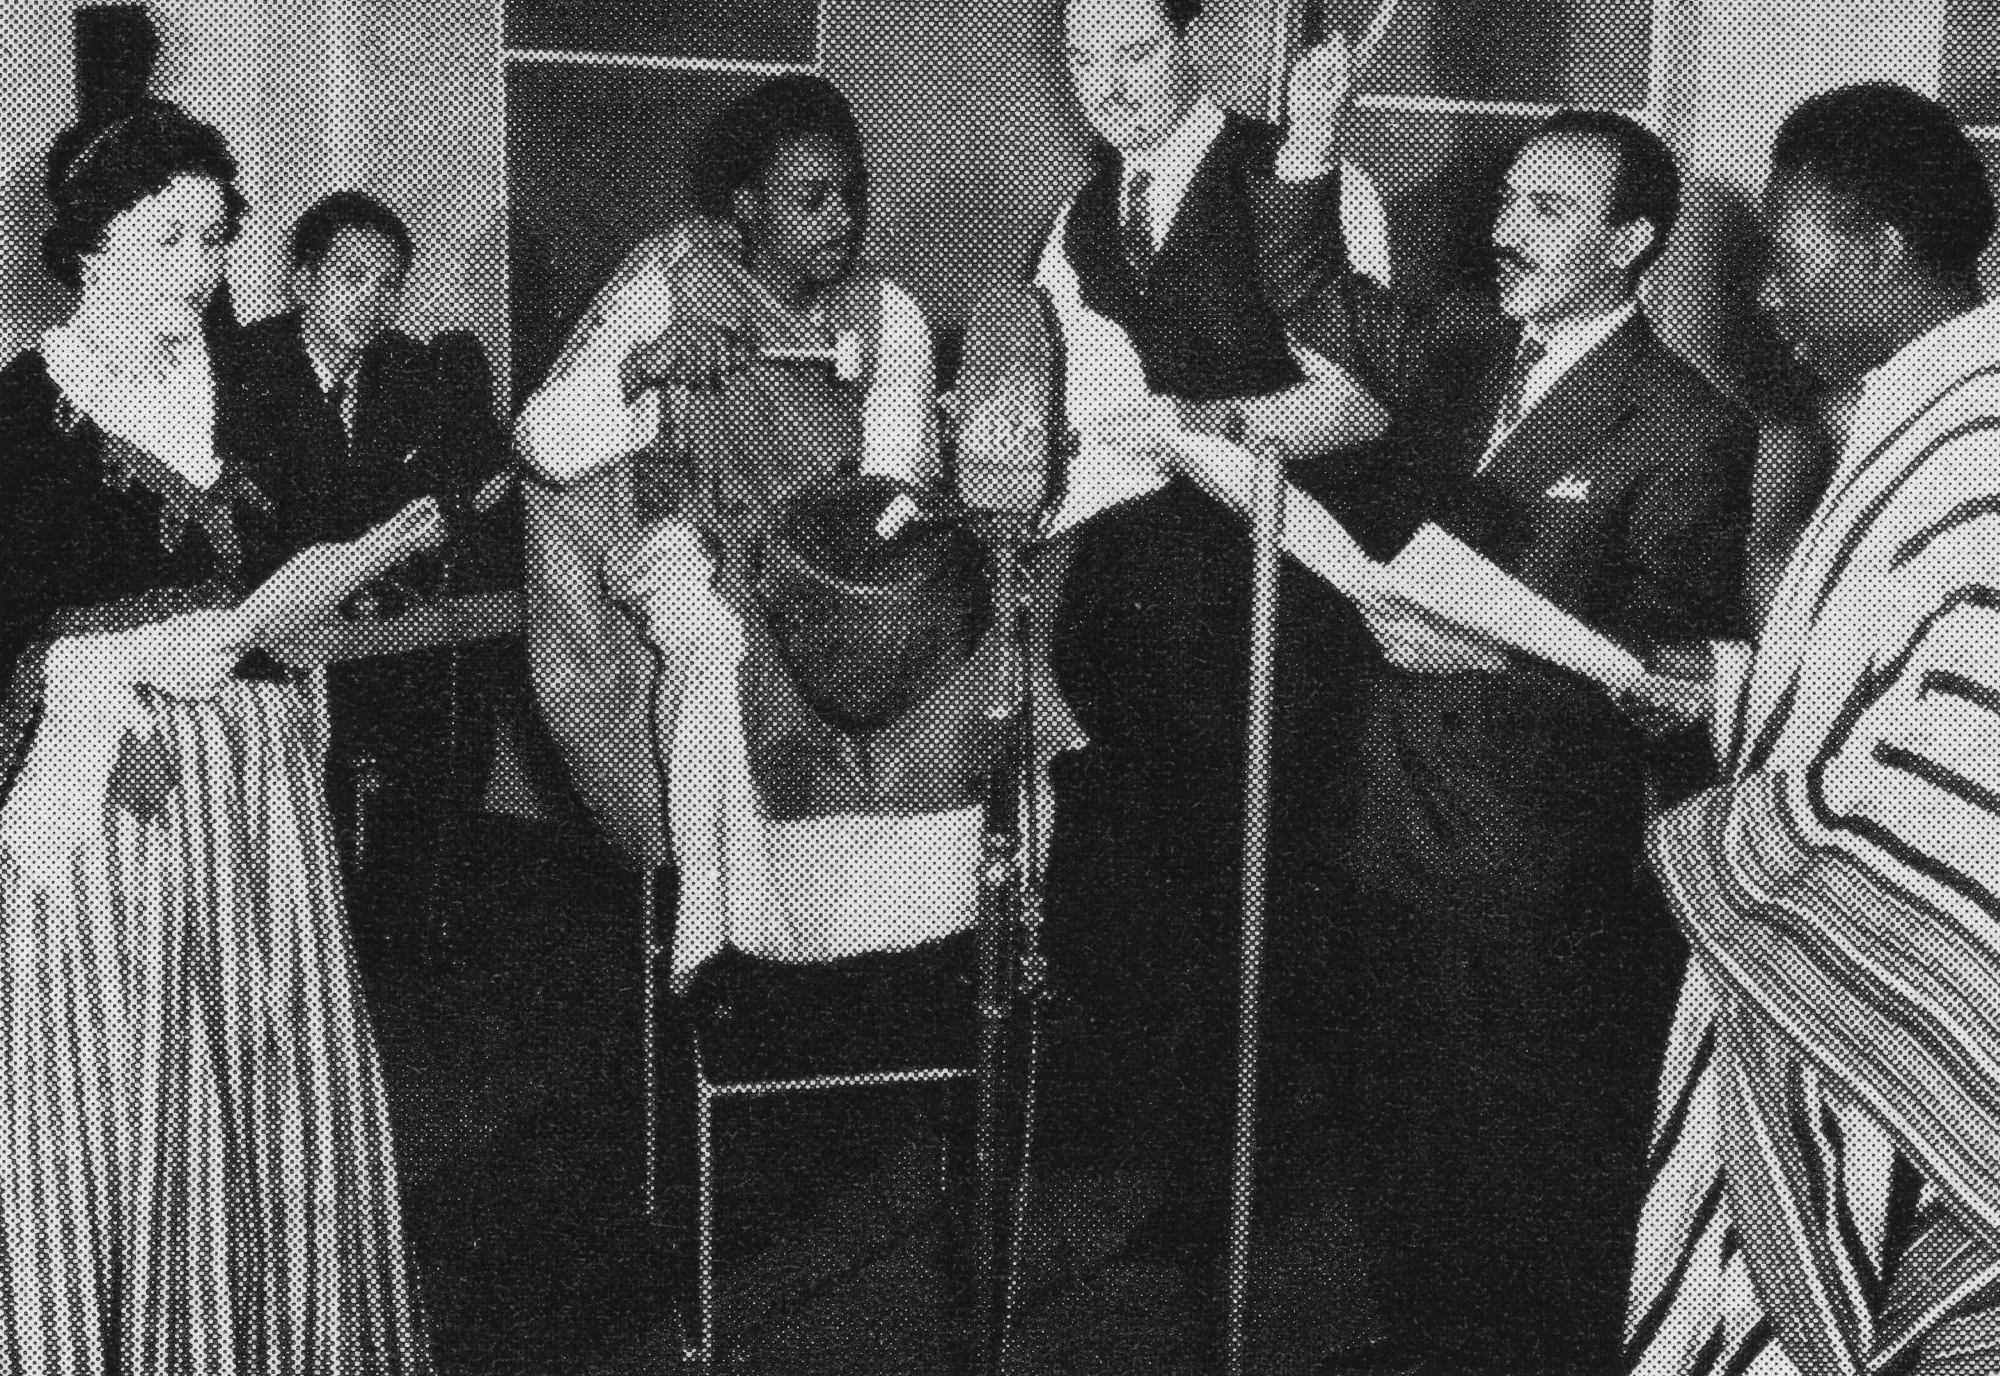 Musicians around a microphone